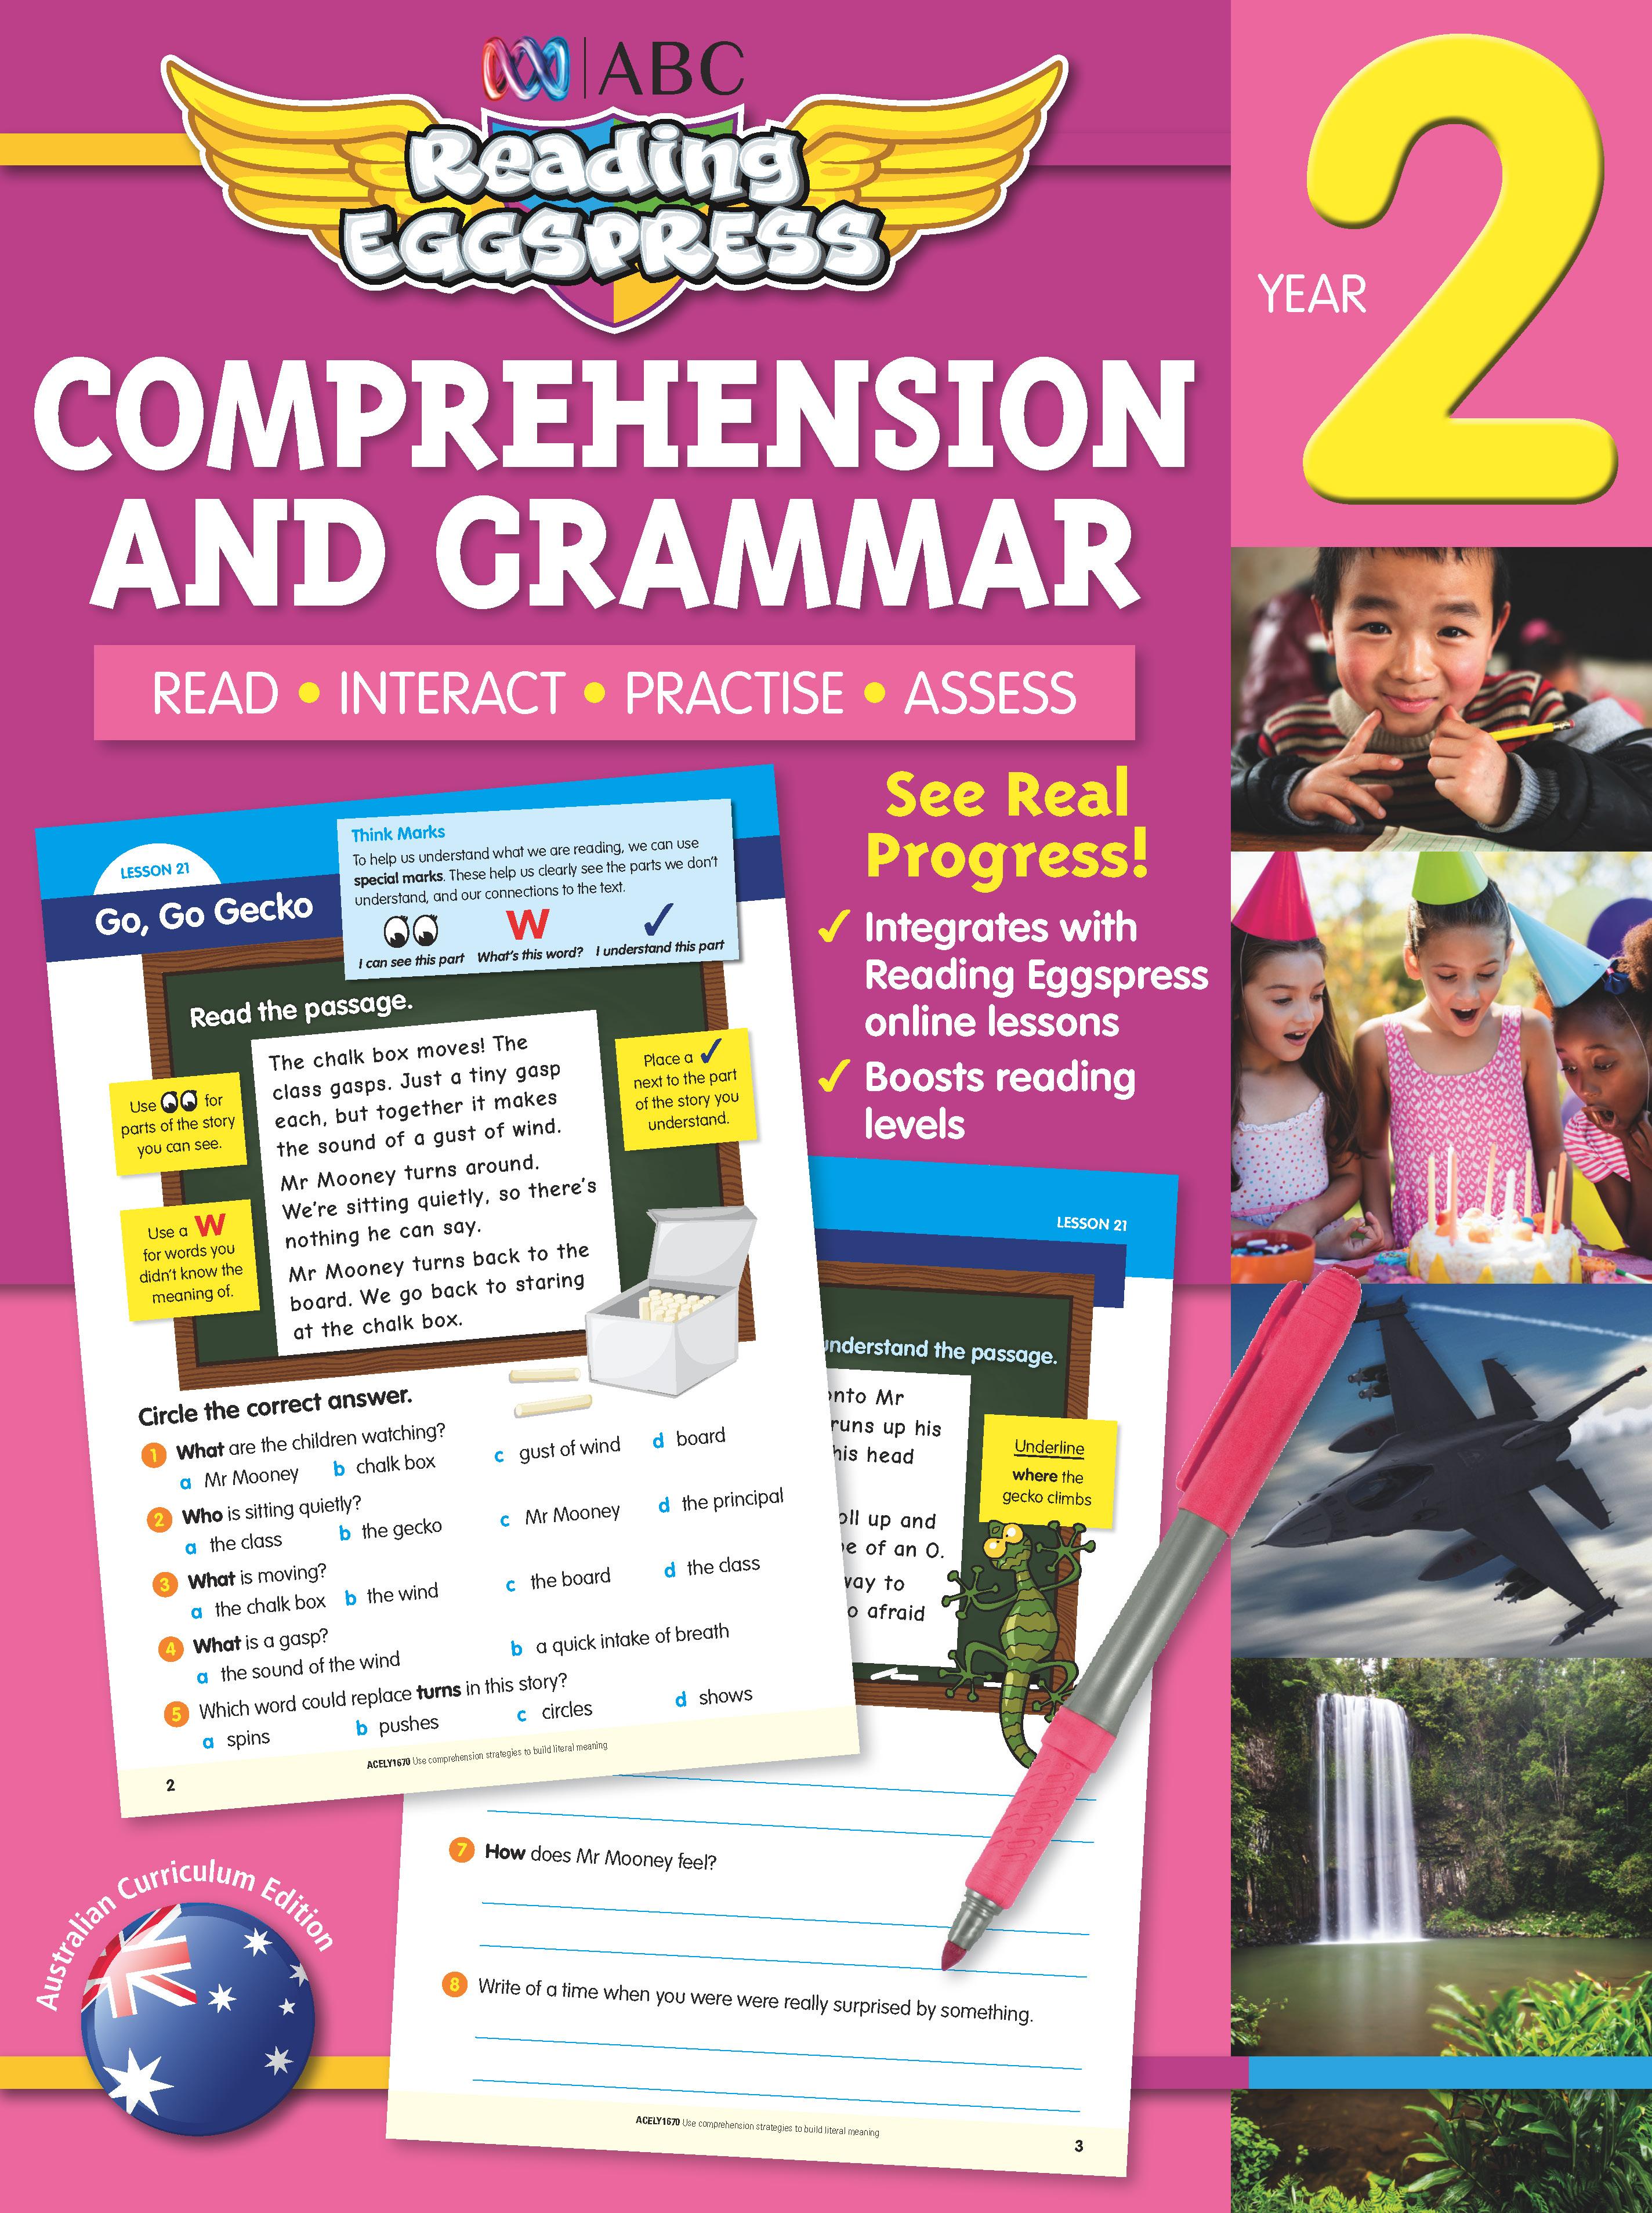 ABC Reading Eggspress Comprehension and Grammar Workbook Year 2